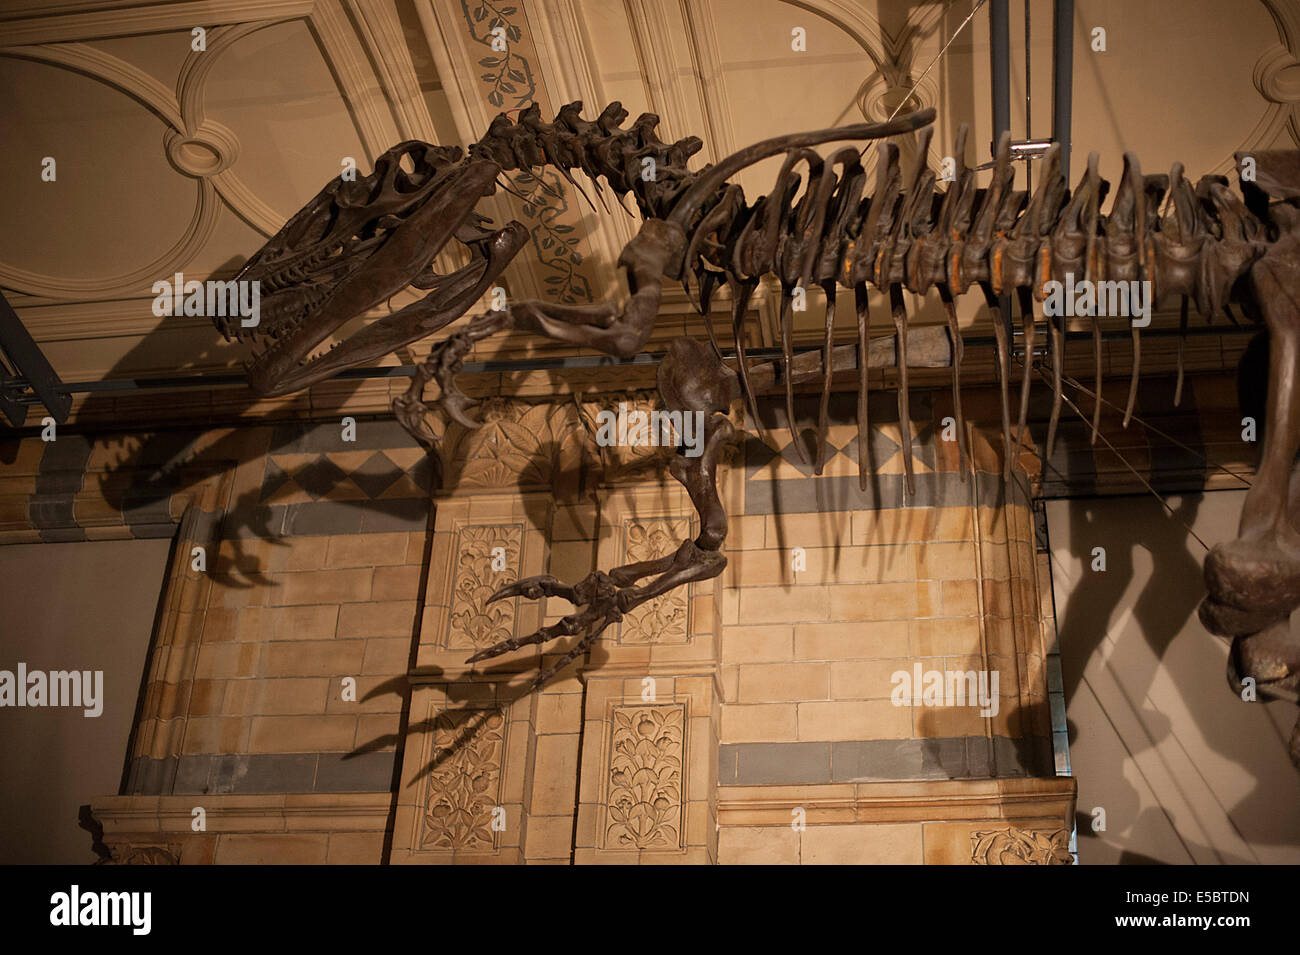 Dinosaur Bernissart Iguanodos  Iguanodon bernissartensîs, Jurassic Period - Stock Image